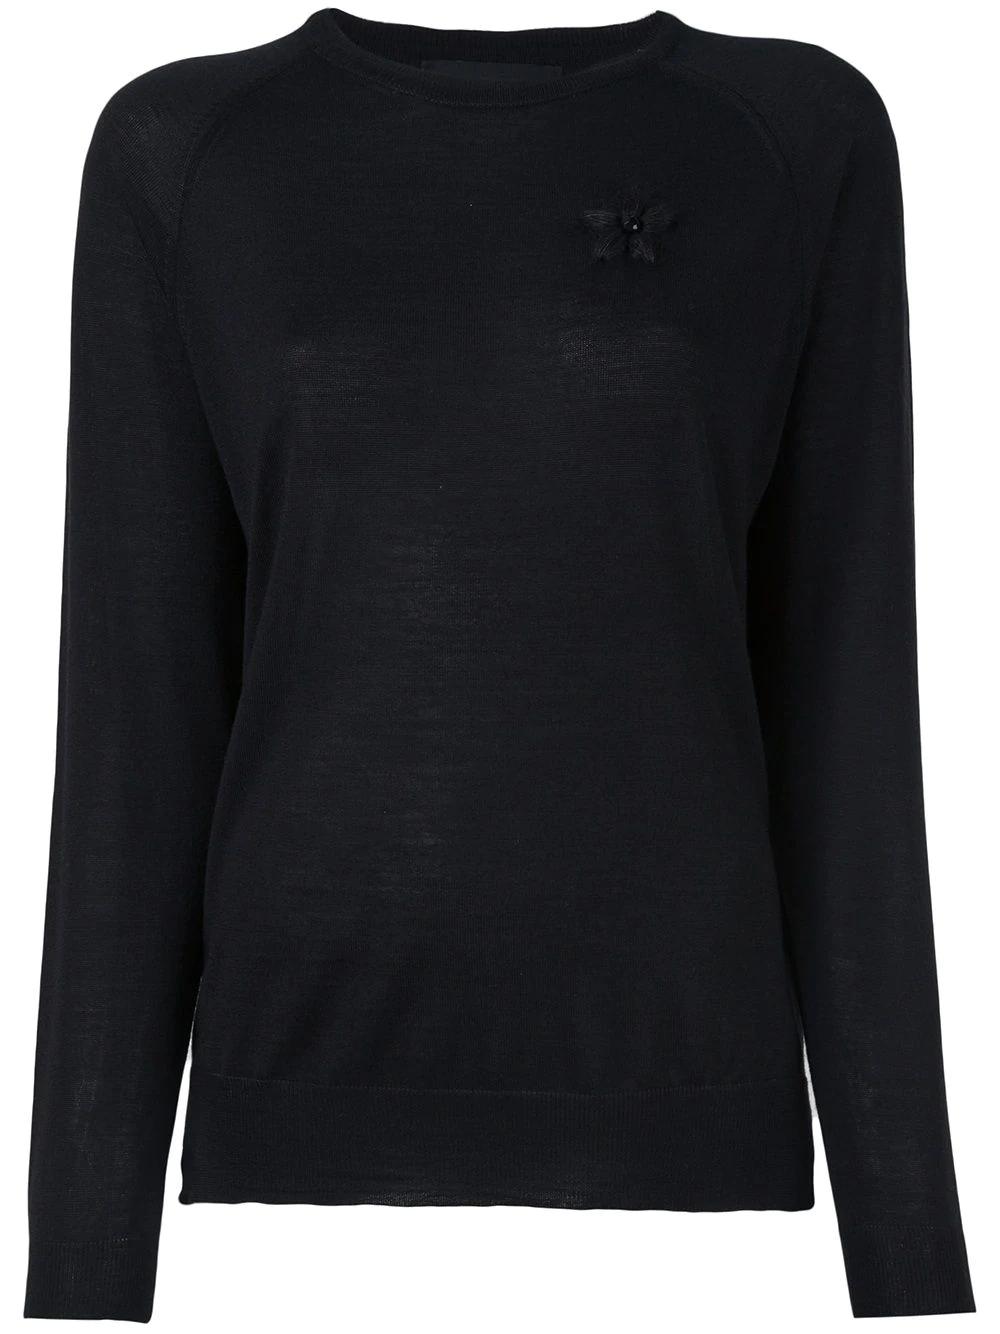 SIMONE ROCHA | свитер с вышивкой | Clouty